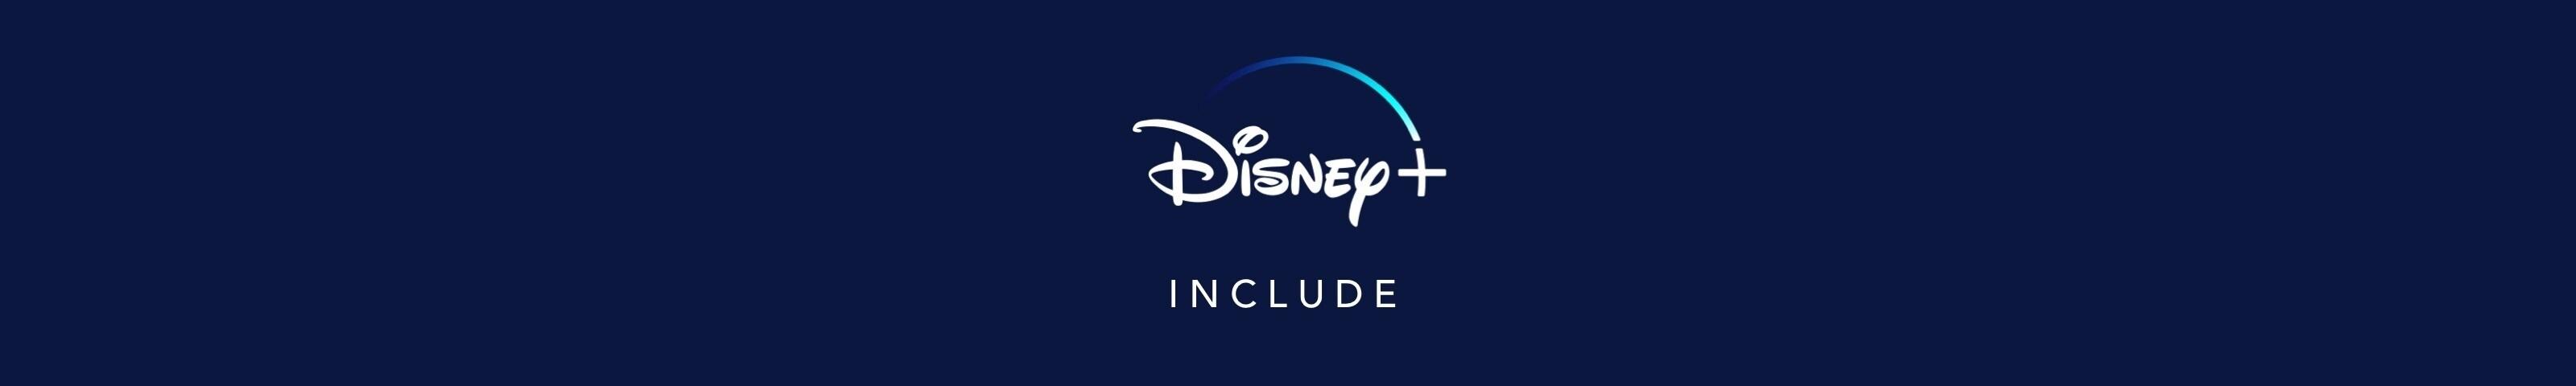 Disney+ include